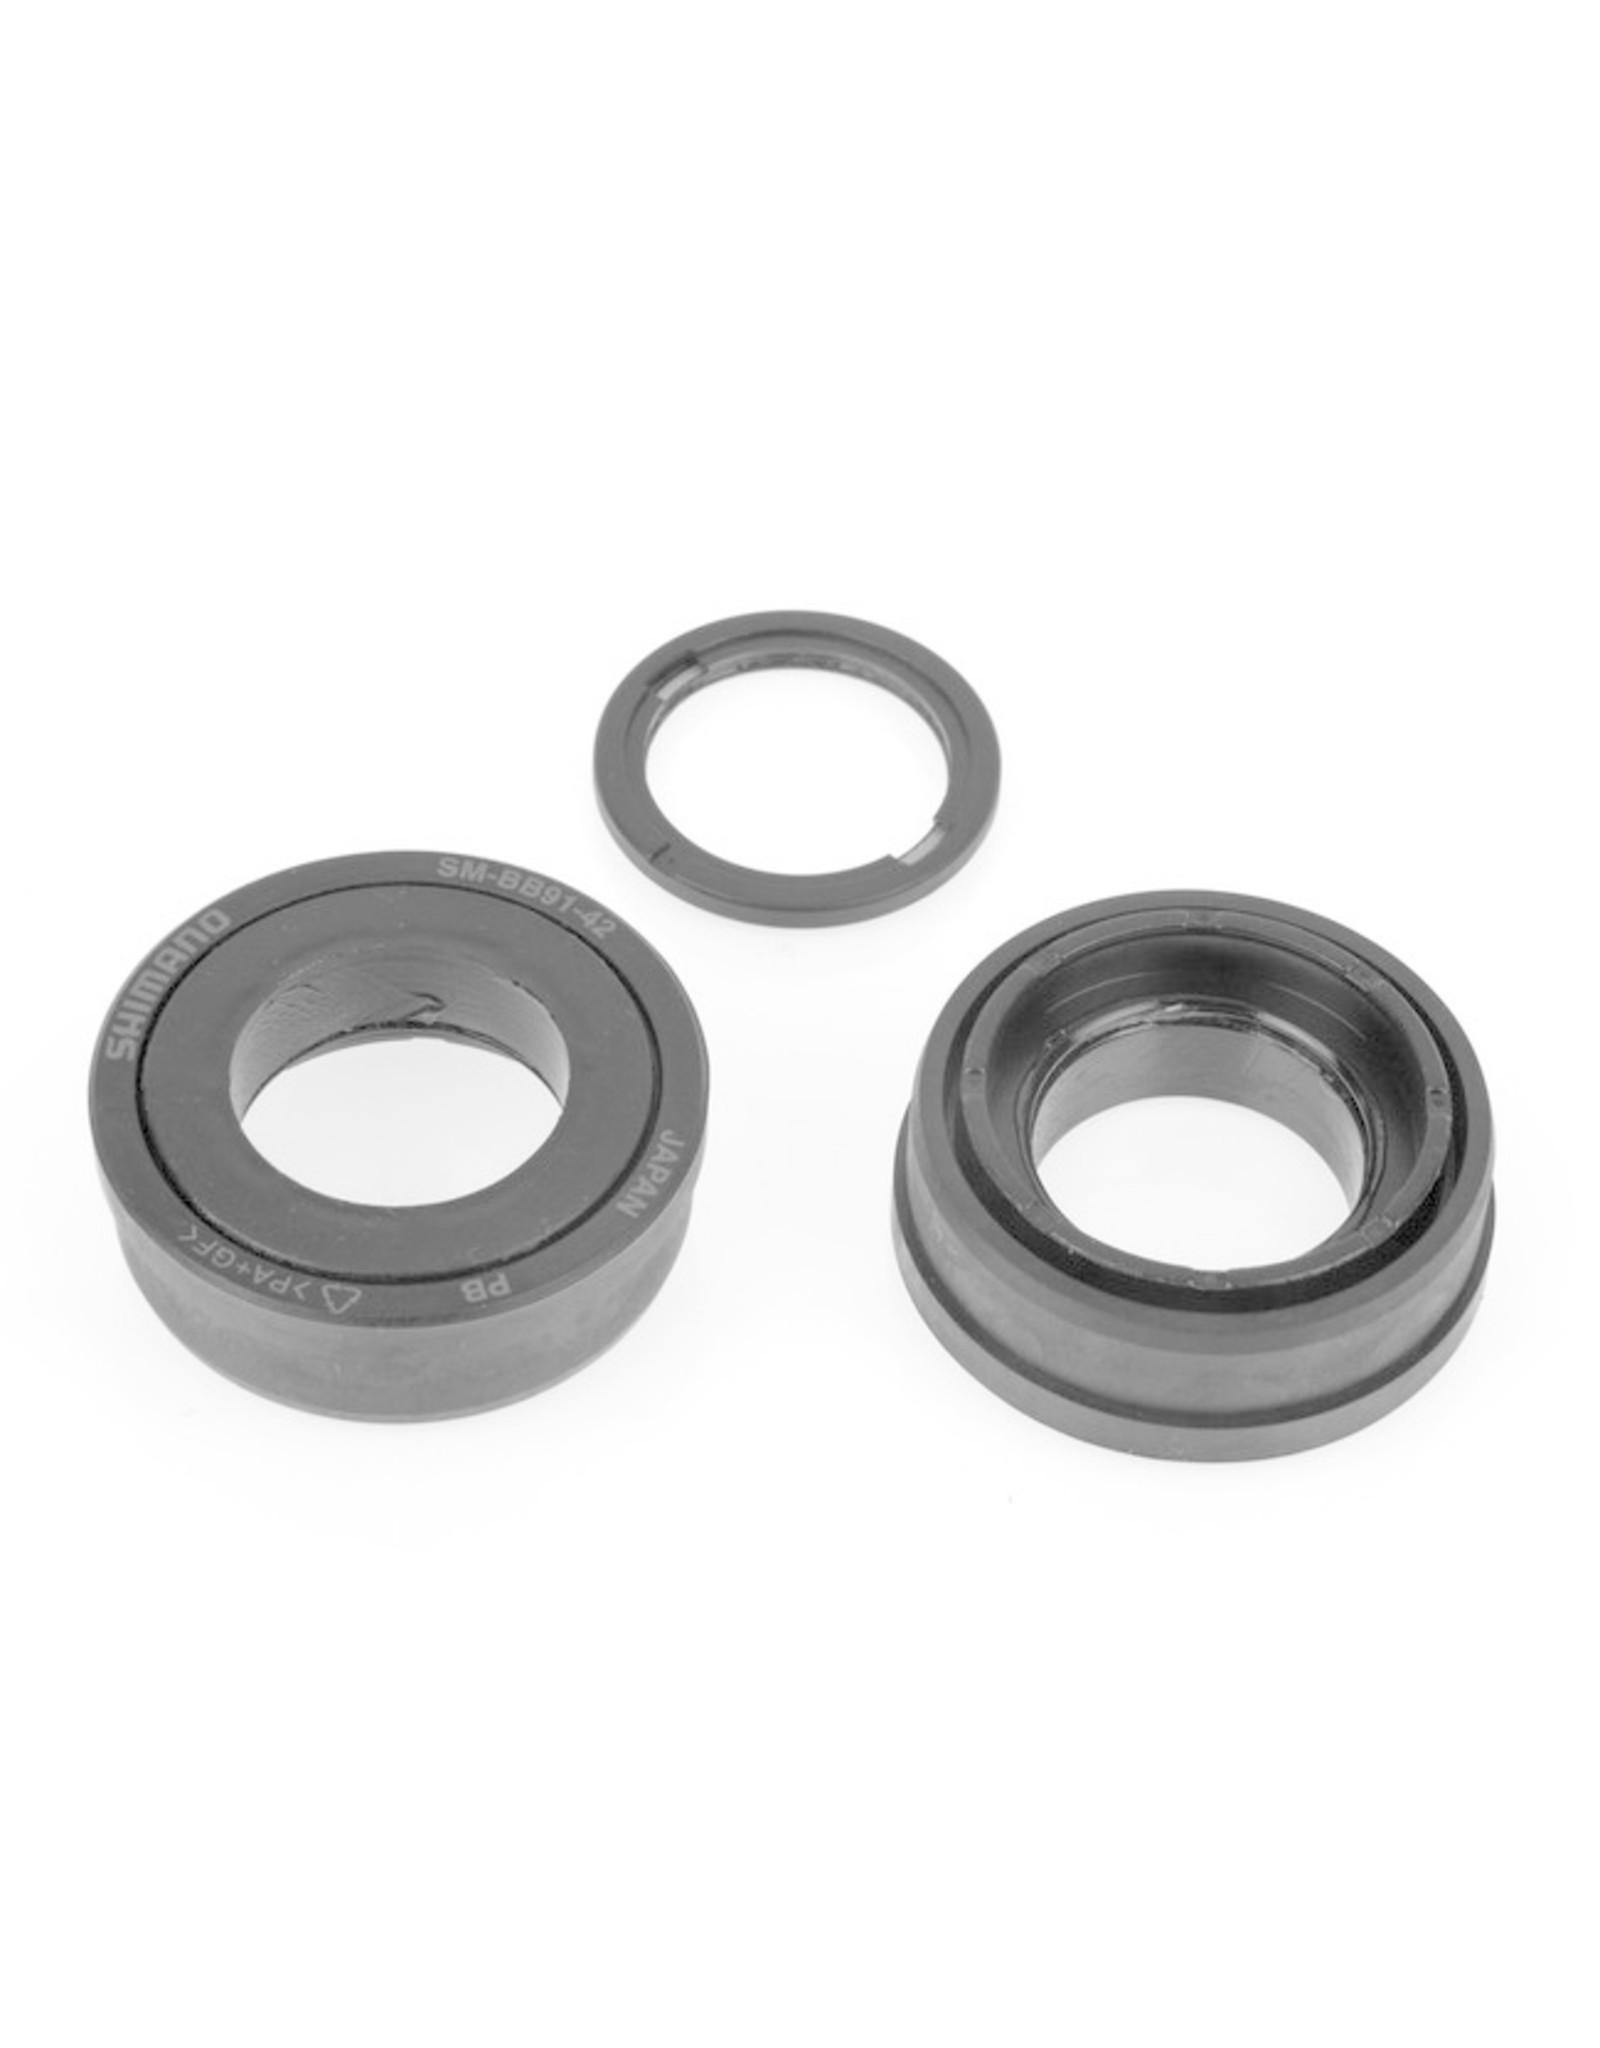 Shimano Bottom bracket Shim press-fit BB91-42A 84.5x42mm (MTB)